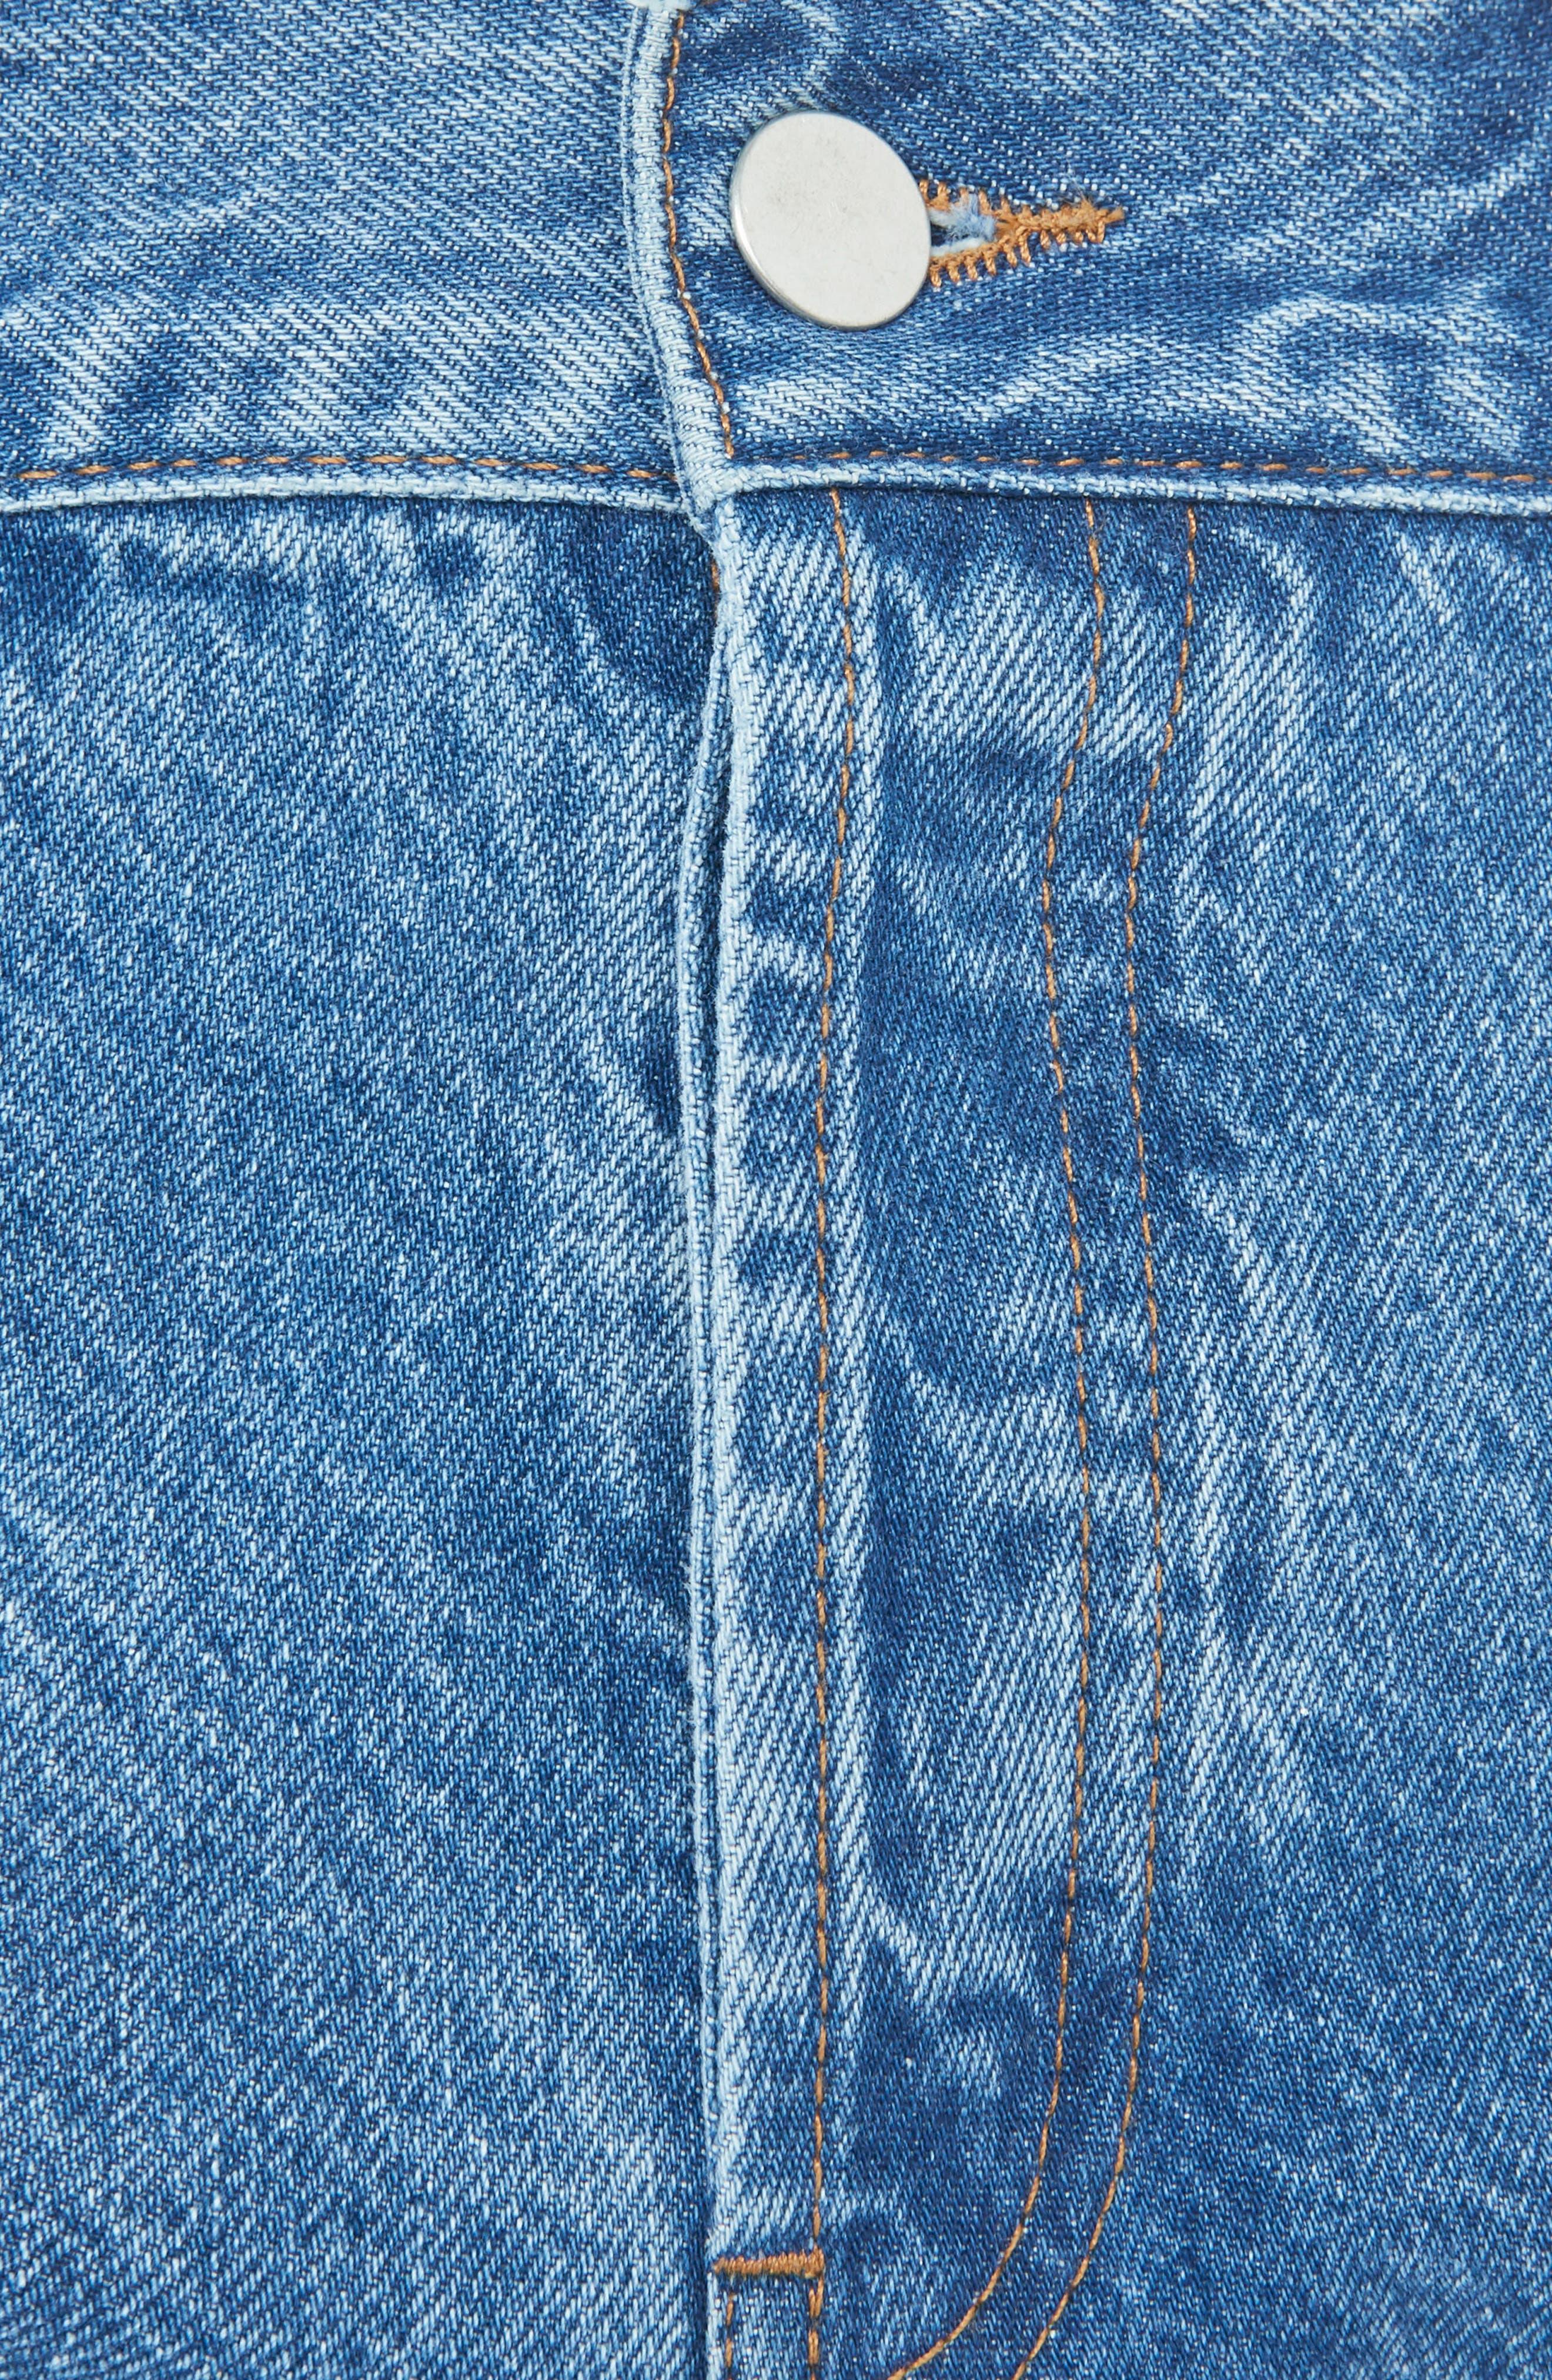 Medium Wash Straight Leg Jeans,                         Main,                         color, 401